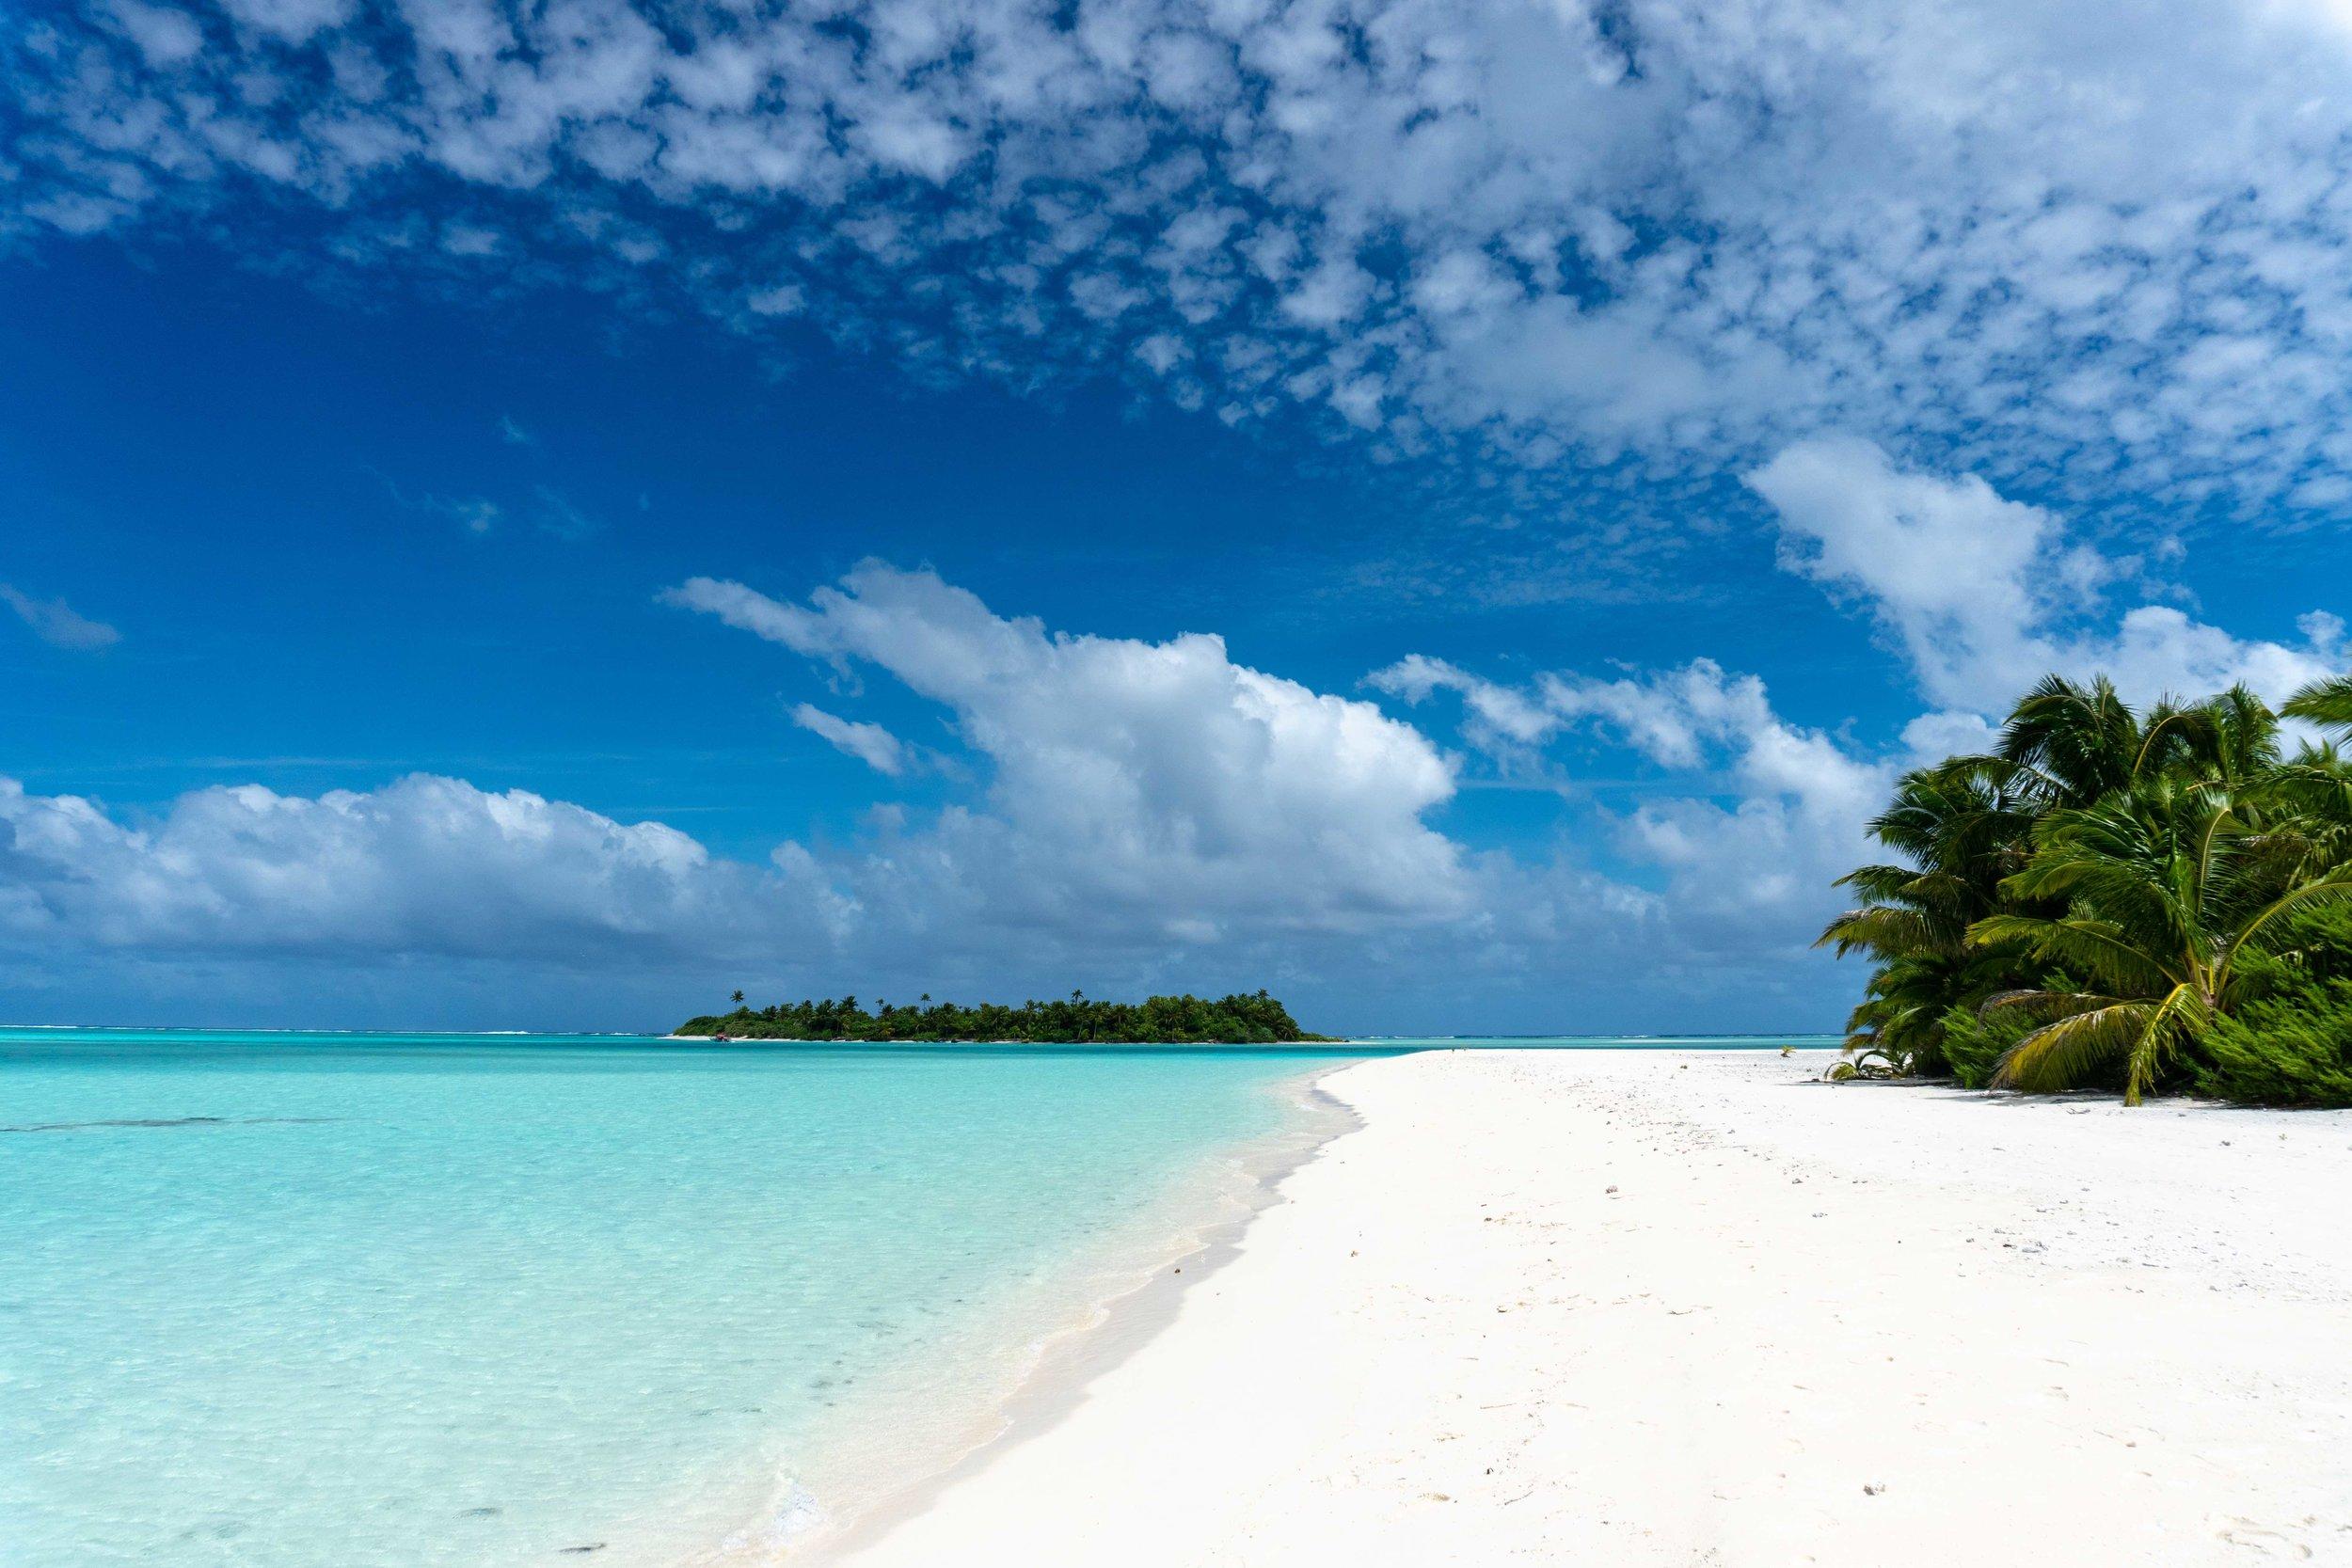 tropical_paradise_beach_island_cook islands_south pacific_1.jpg